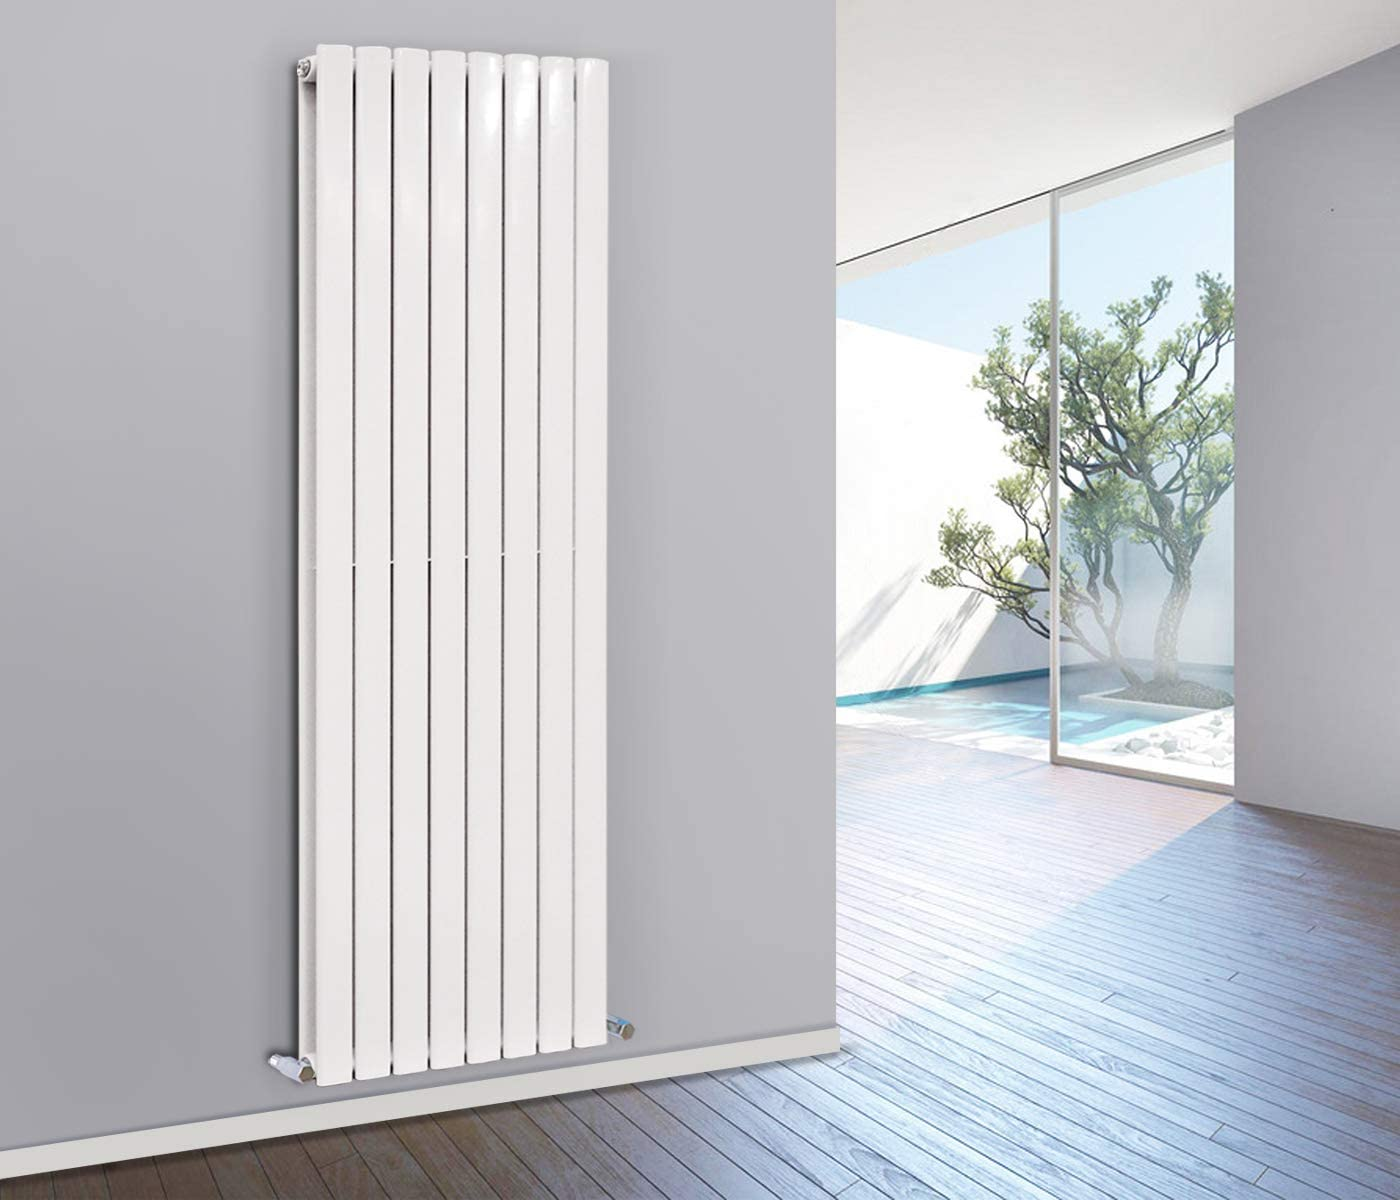 NRG Tall Vertical Flat Panel Radiator Designer Double Column Bathroom Heater Central Heating White 1800x544mm